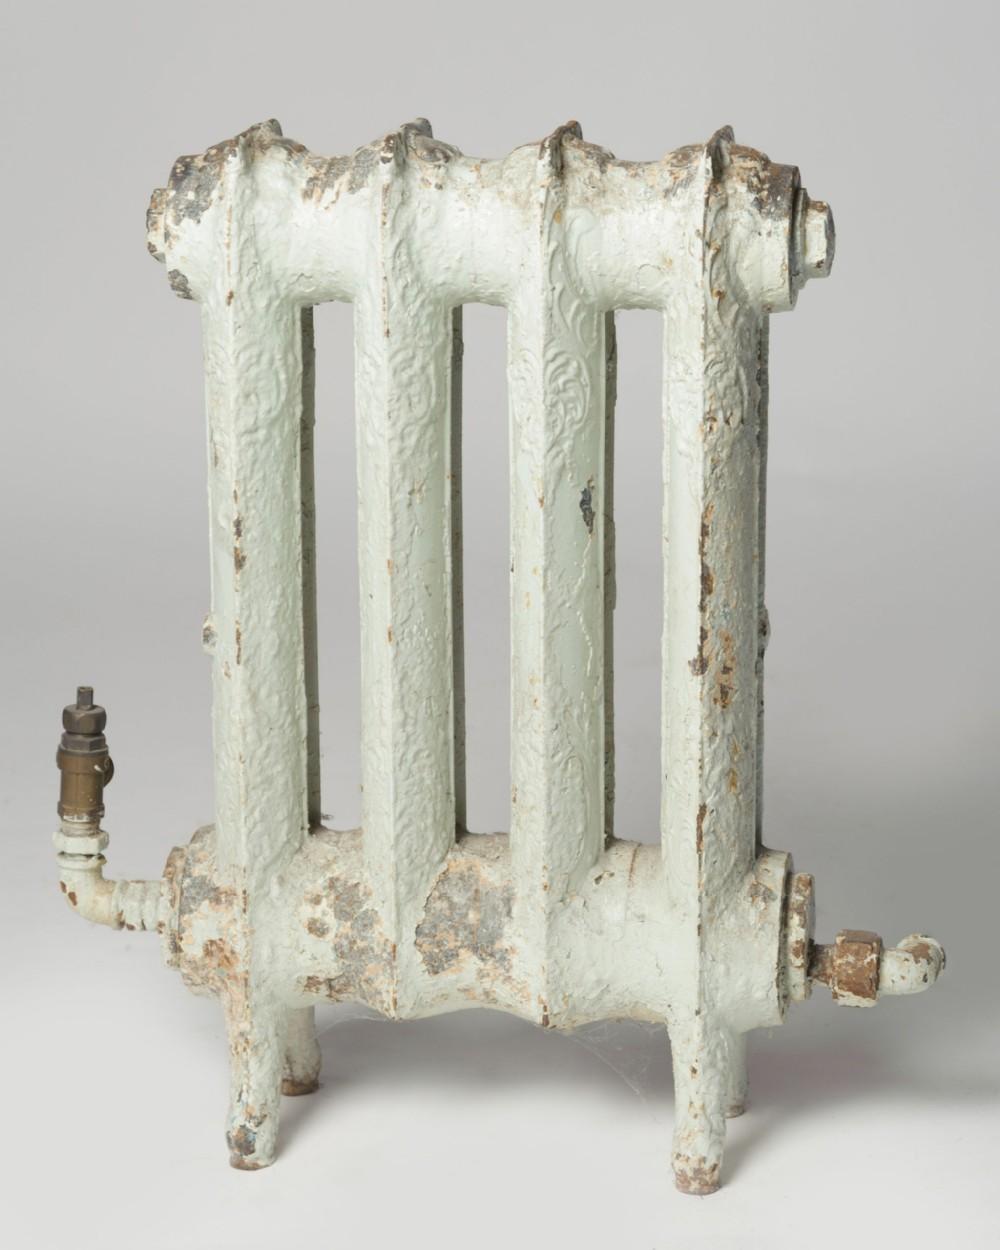 rare small antique cast iron radiator